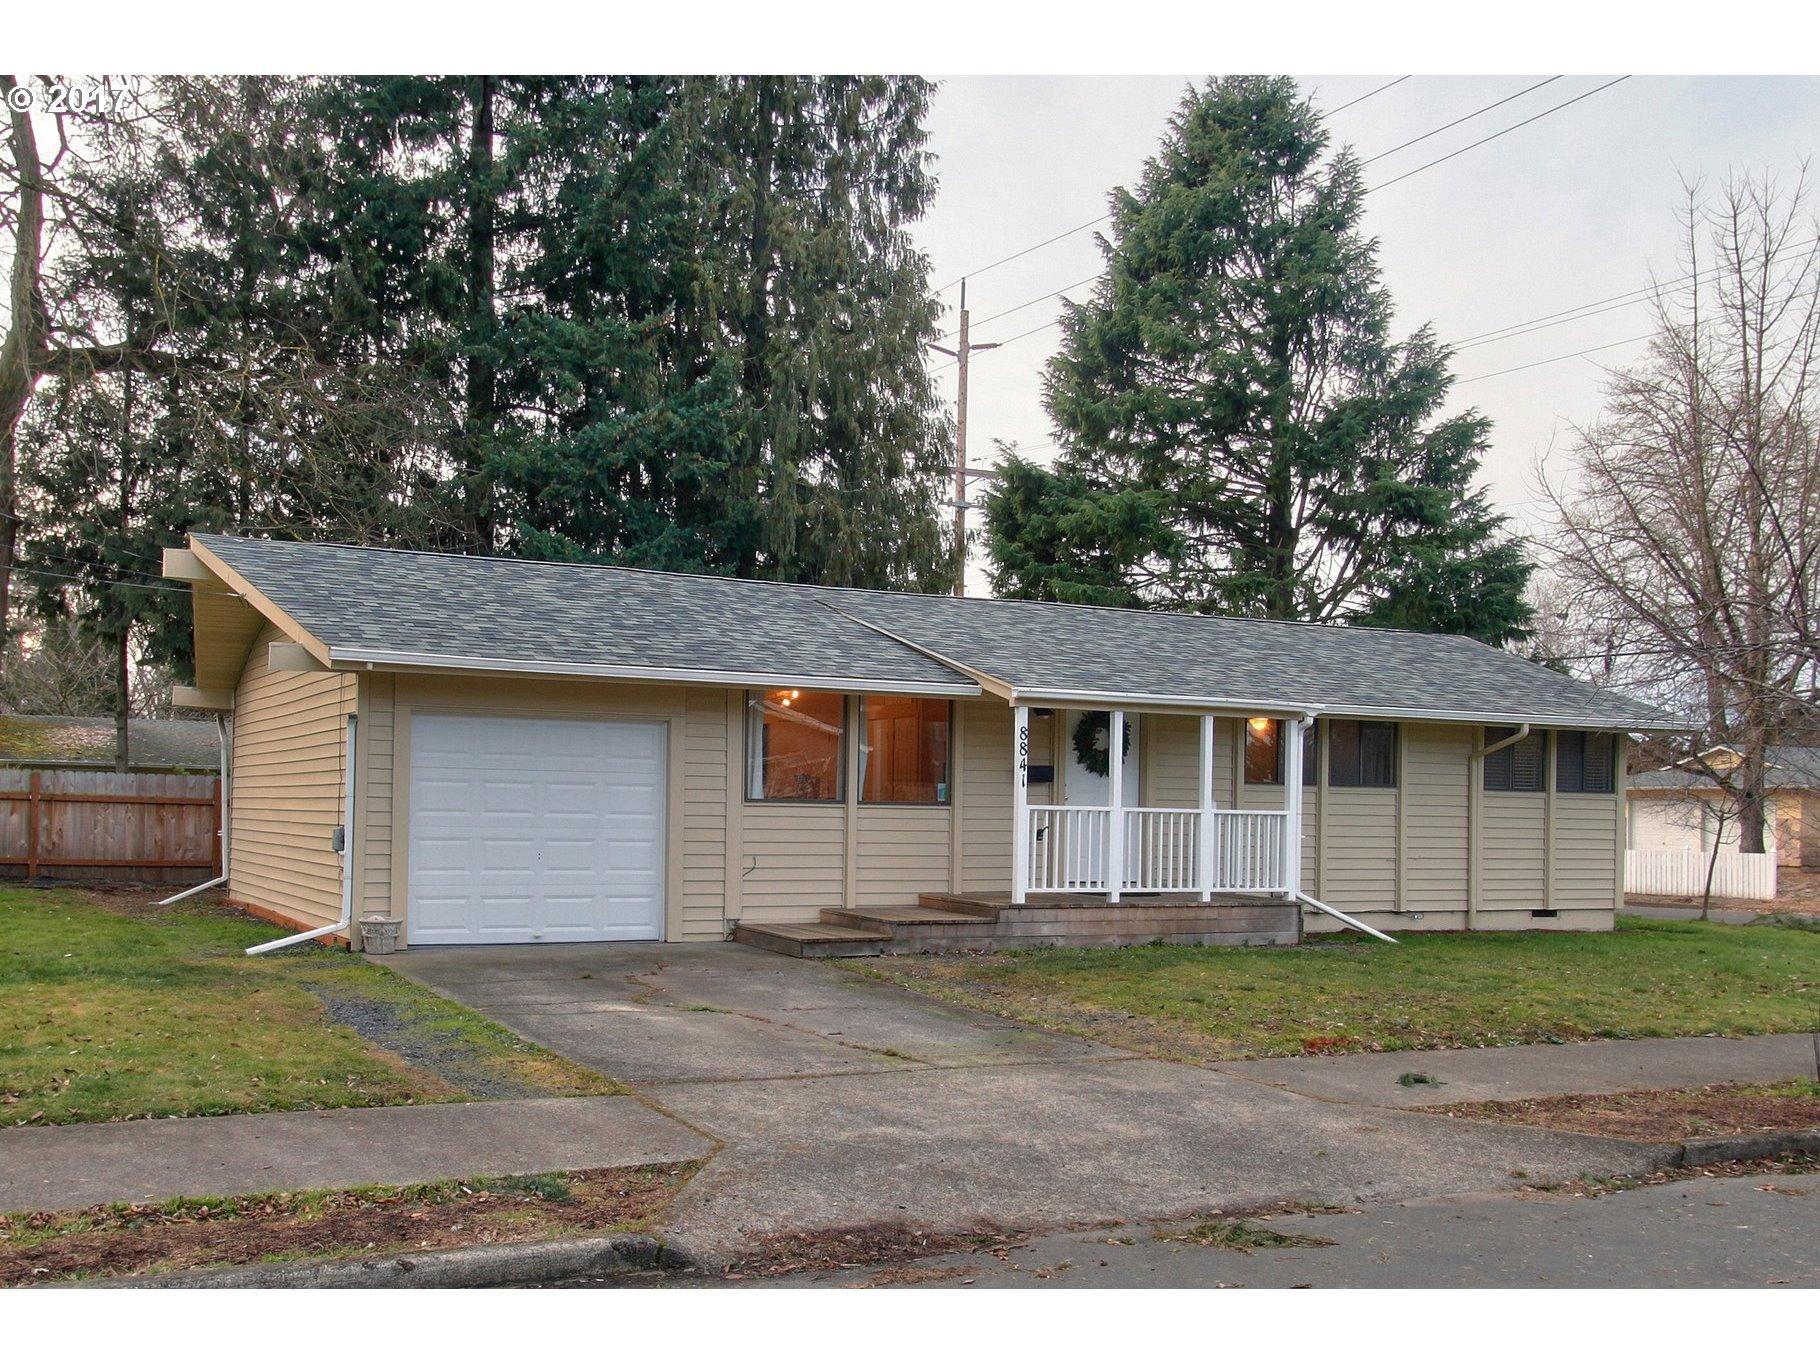 8841 N HAMLIN AVE, Portland, OR 97217